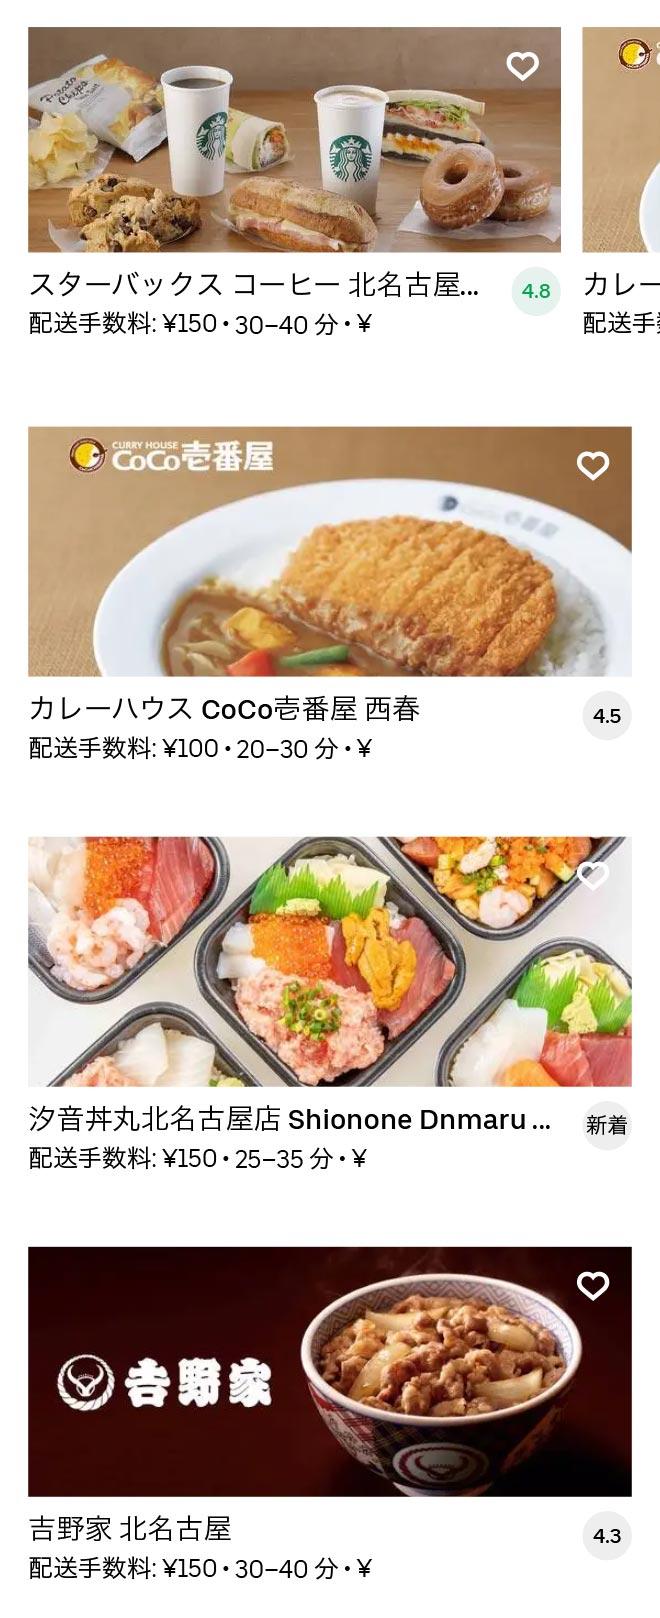 Nishiharu menu 2010 02